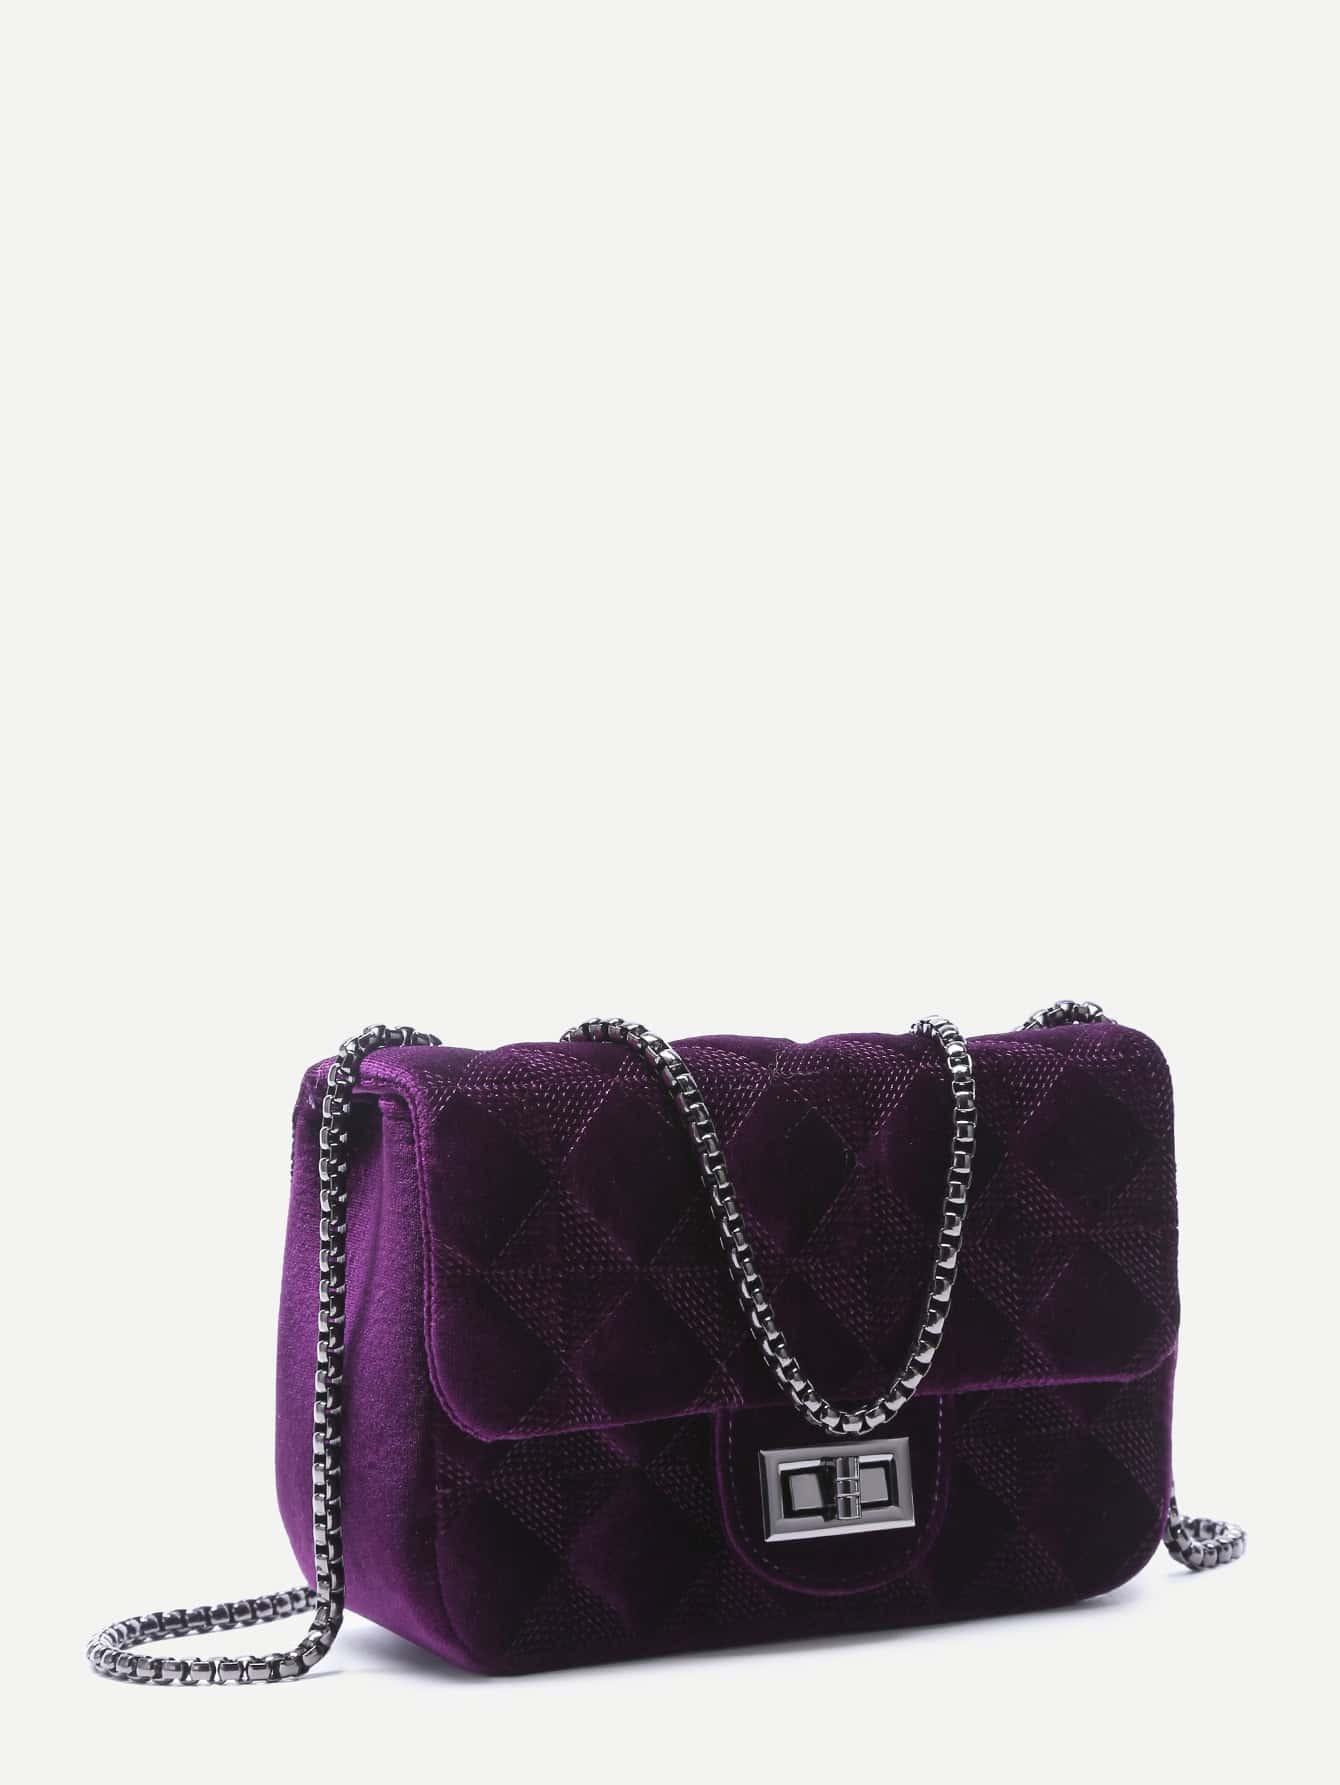 bag161109907_2